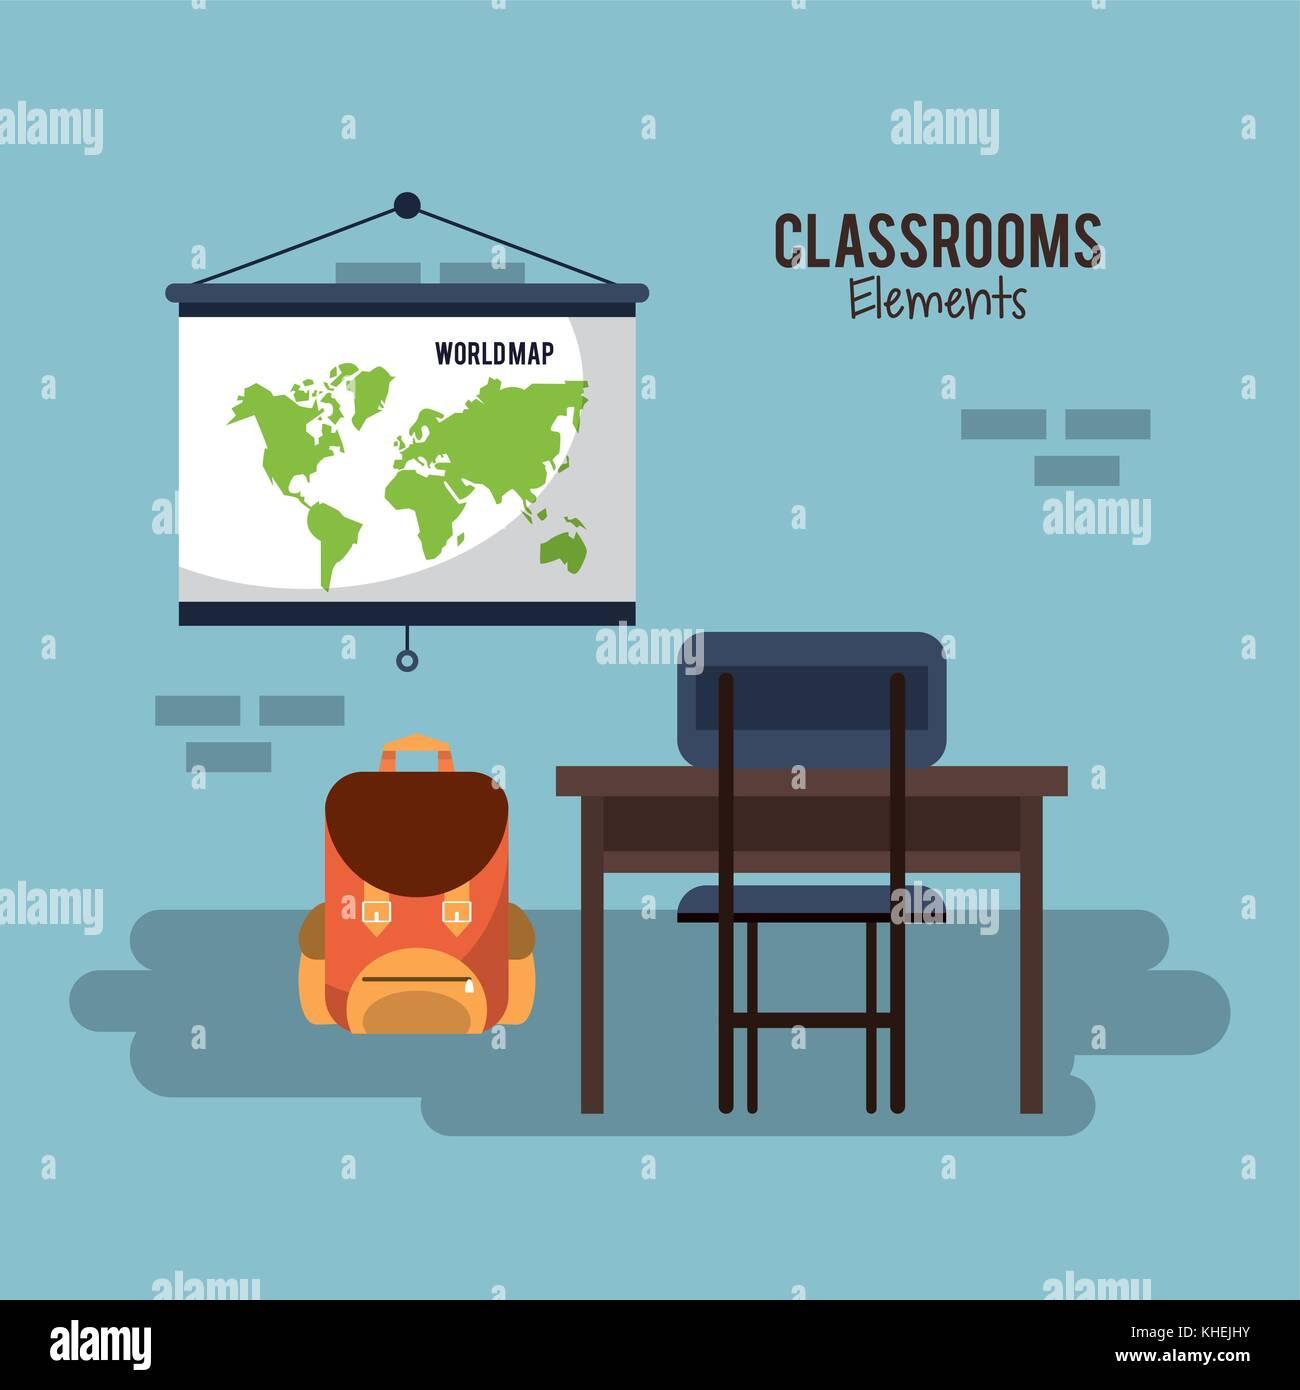 Classroom Design Elements ~ Illustration maps stock photos